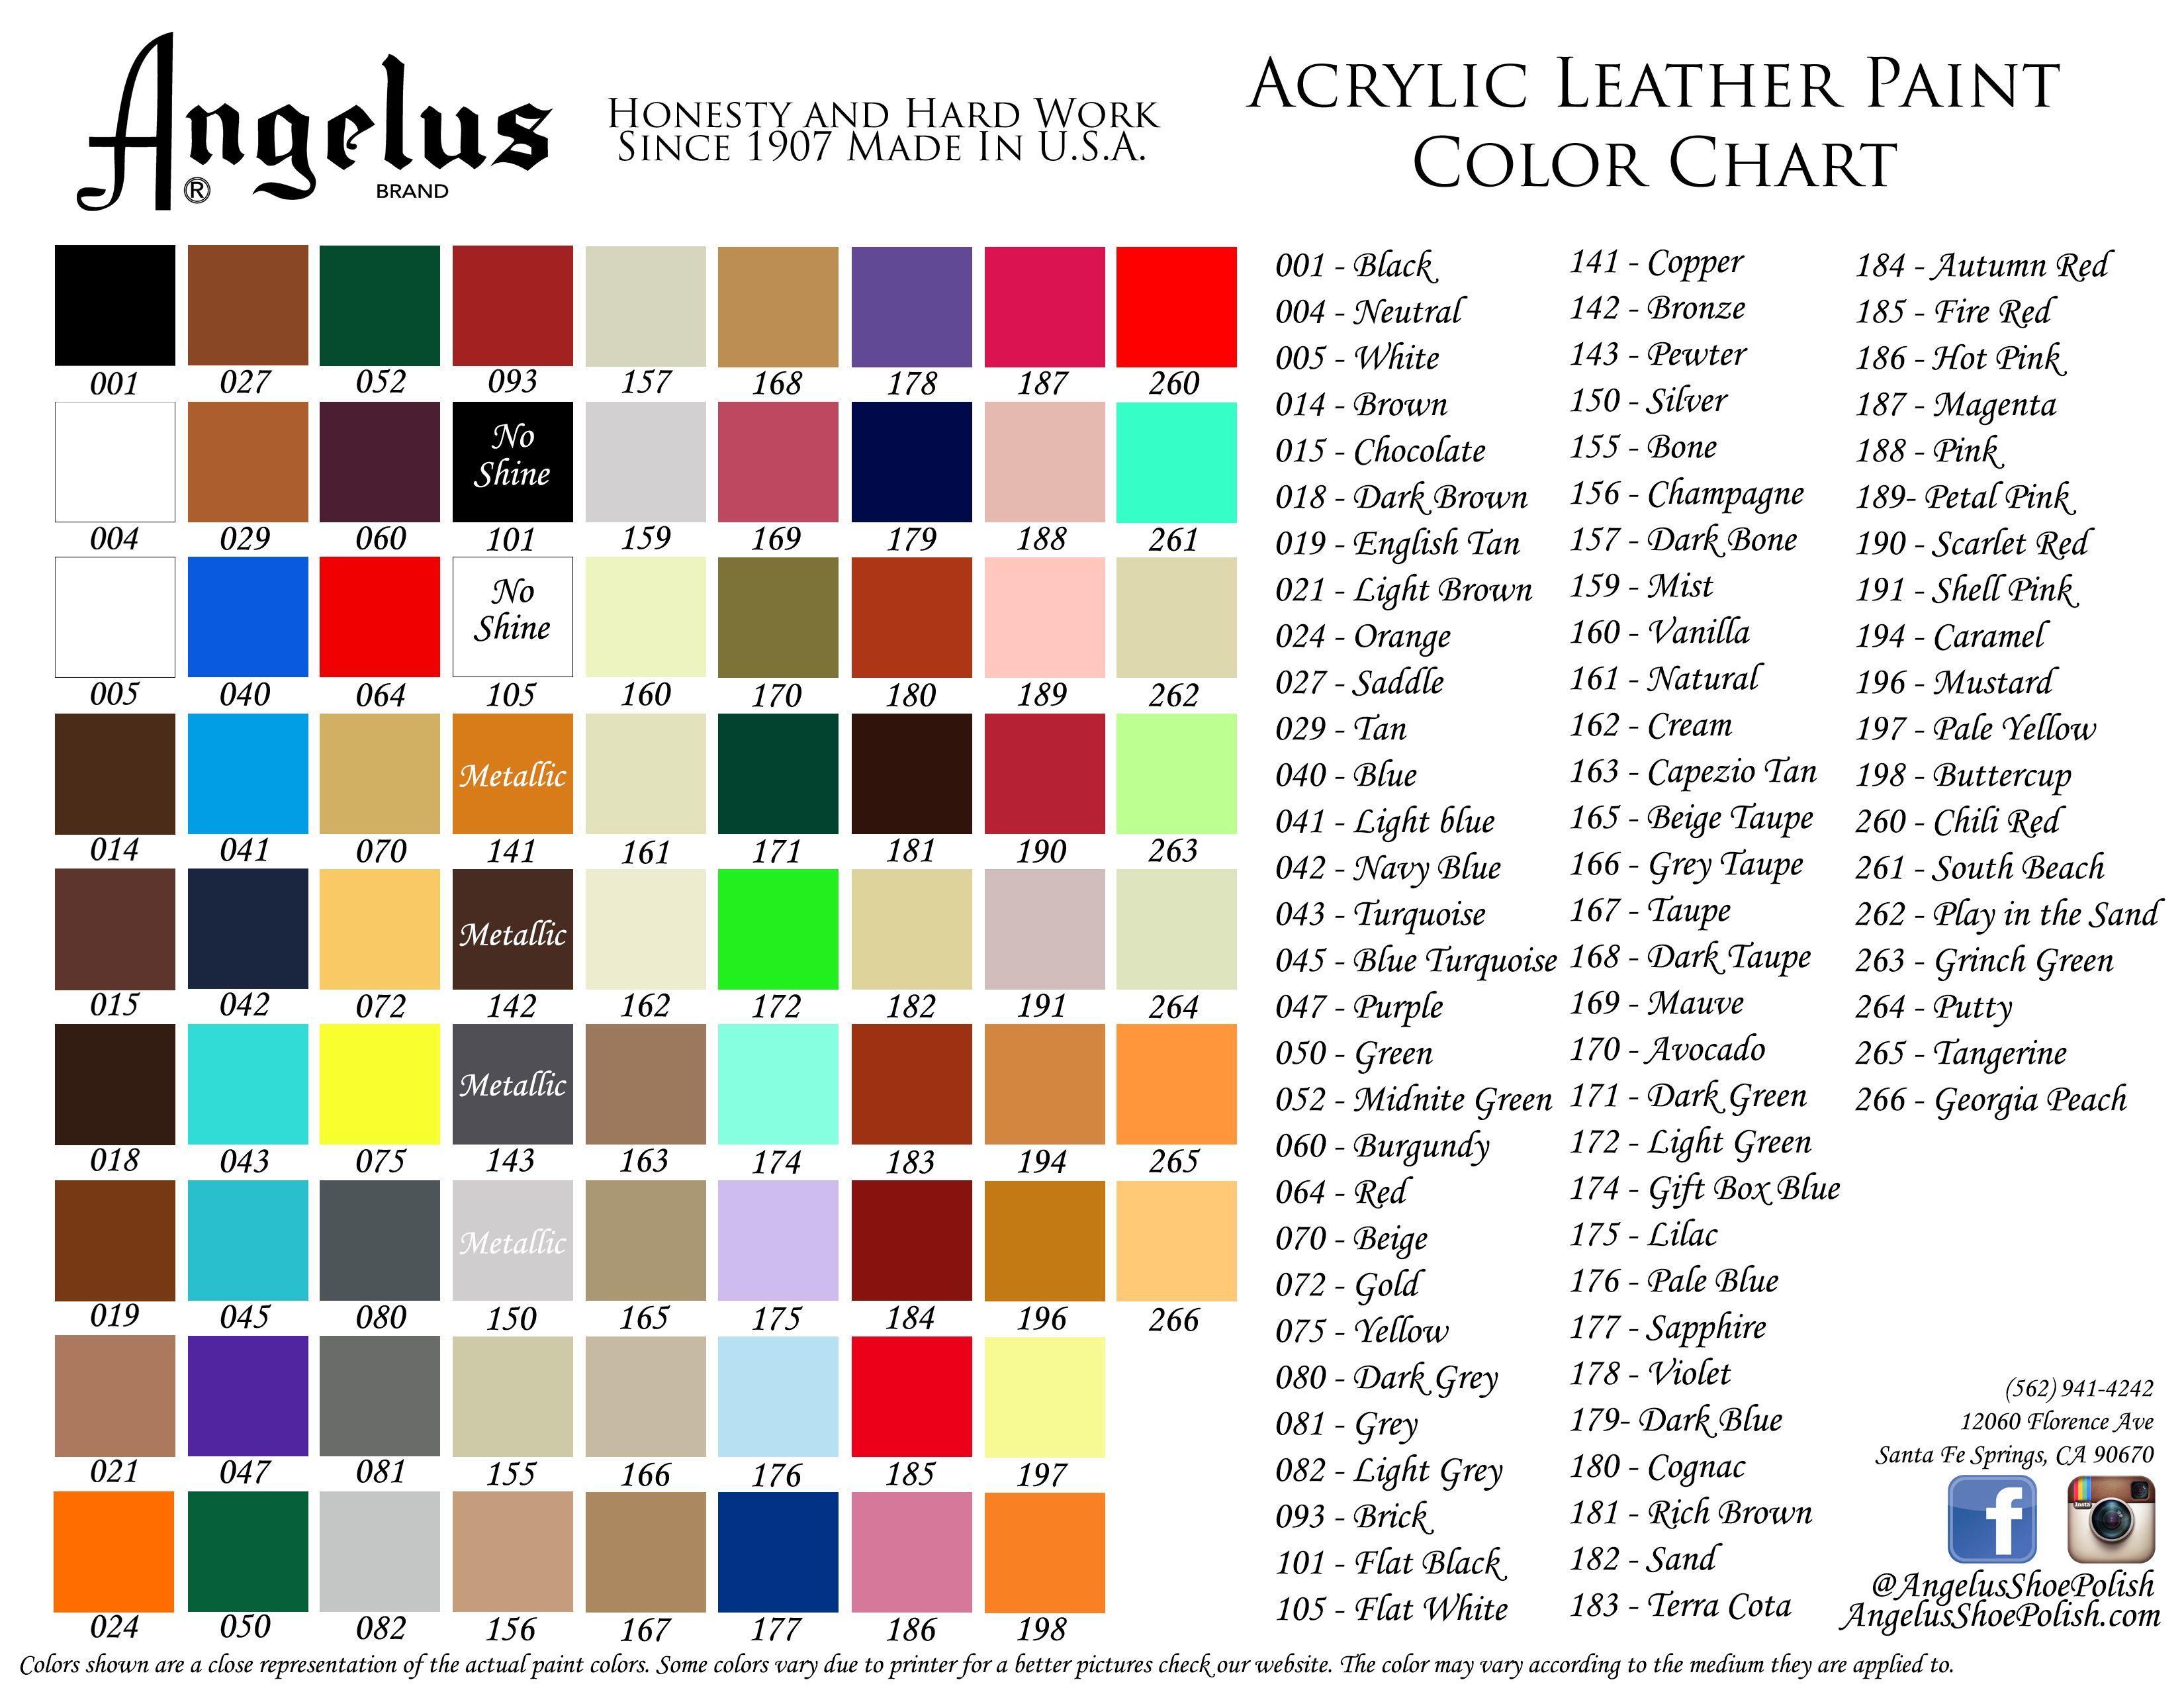 Folk art color chart acrylic paint - Color_chart_092013_d76418fb 699e 455f Ae3a Bb30484490ef Jpg 3300 2550 Paint Colour Chartspaint